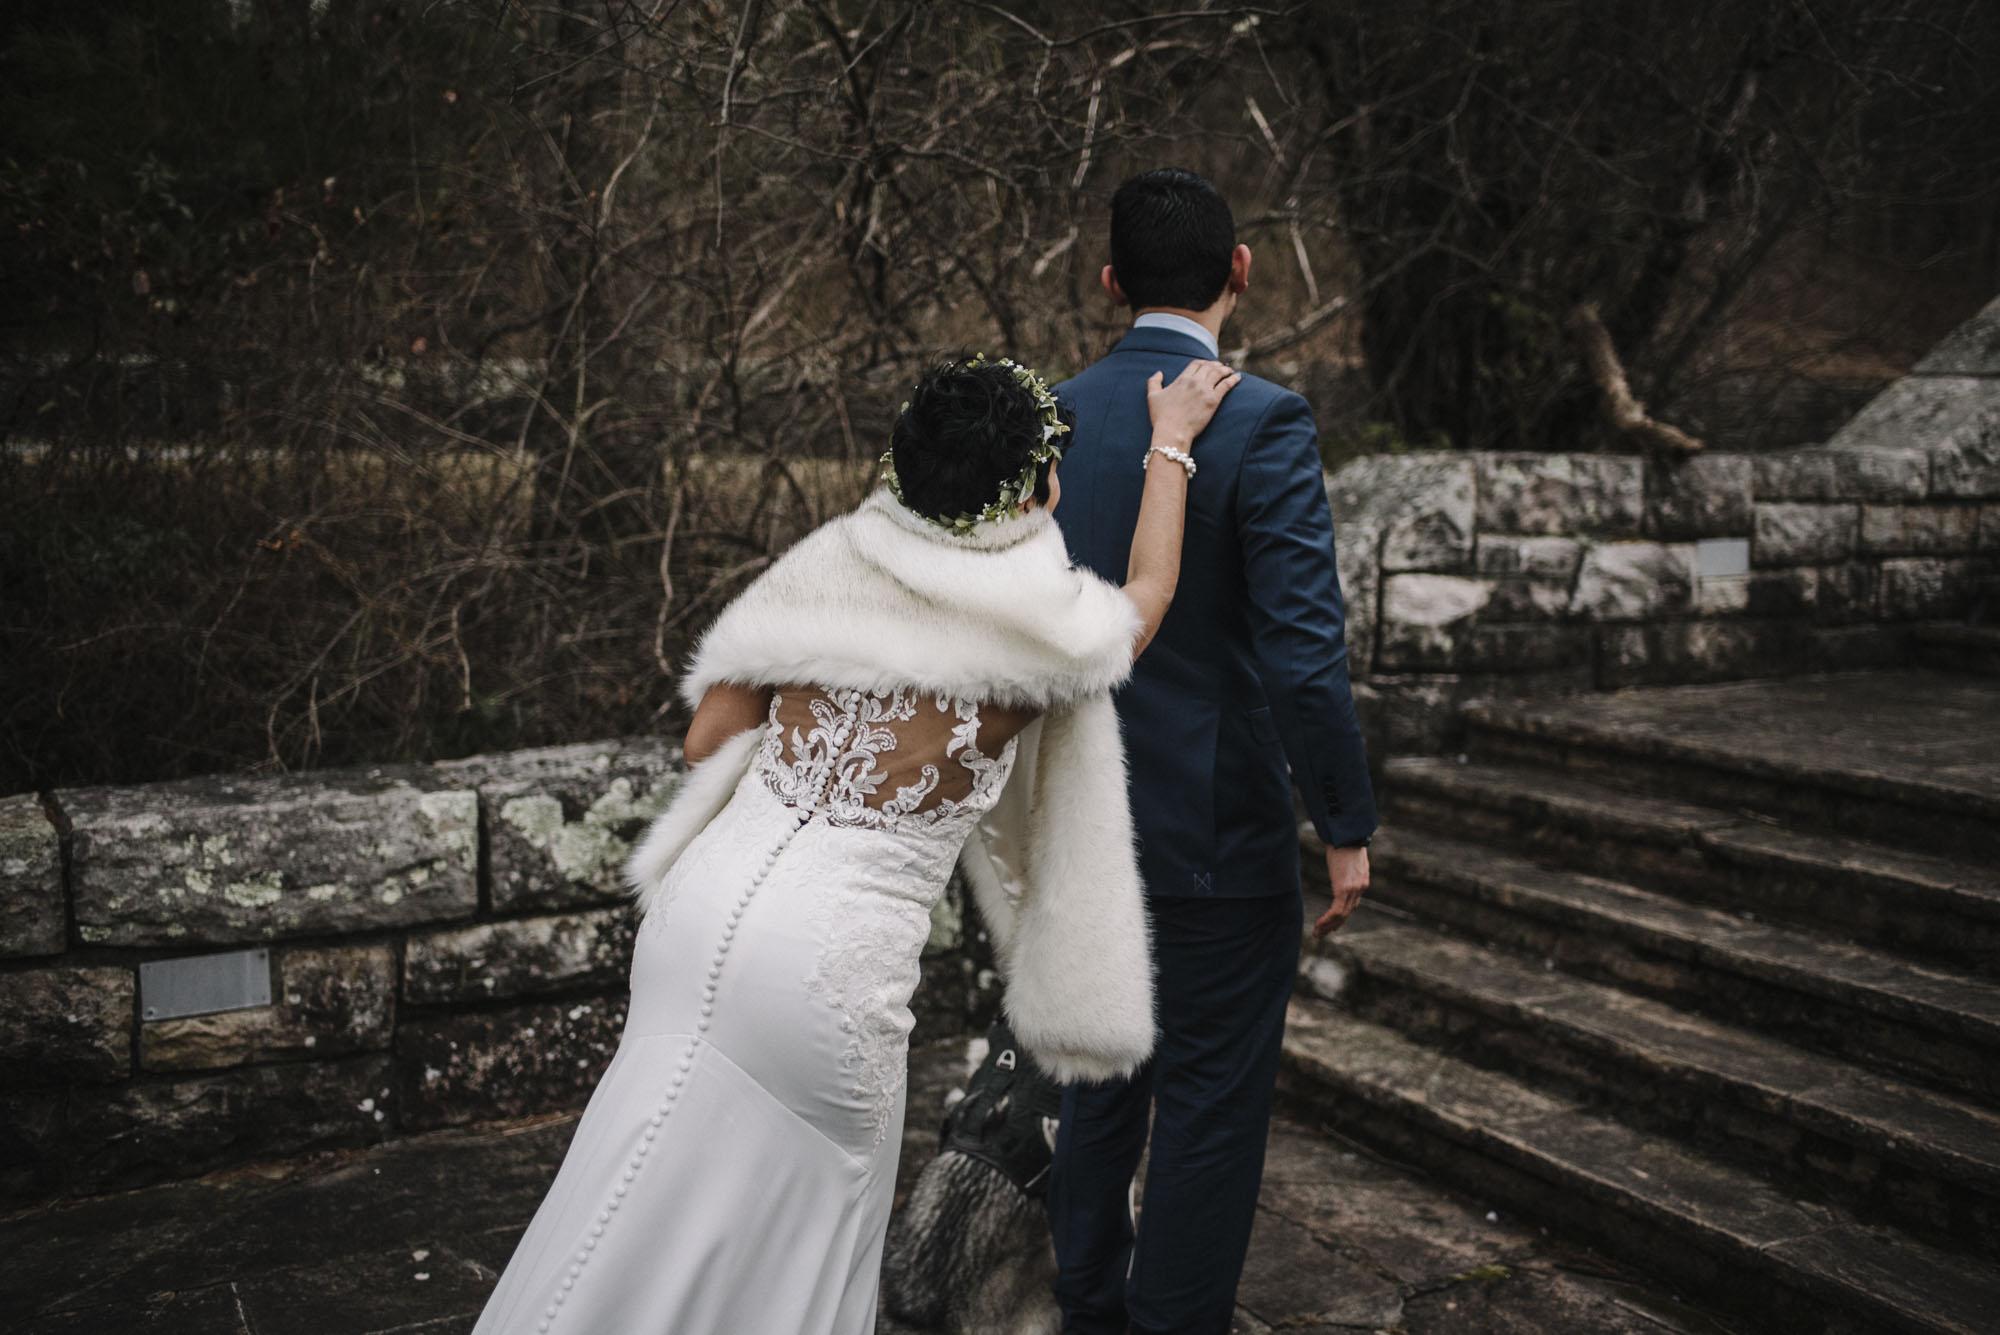 Game of Thrones Elopement - Winter Elopement - Shenandoah National Park Elopement Photographer - Virginia Adventure Photographer - Blue Ridge Parkway Elopement Photographer_5.jpg